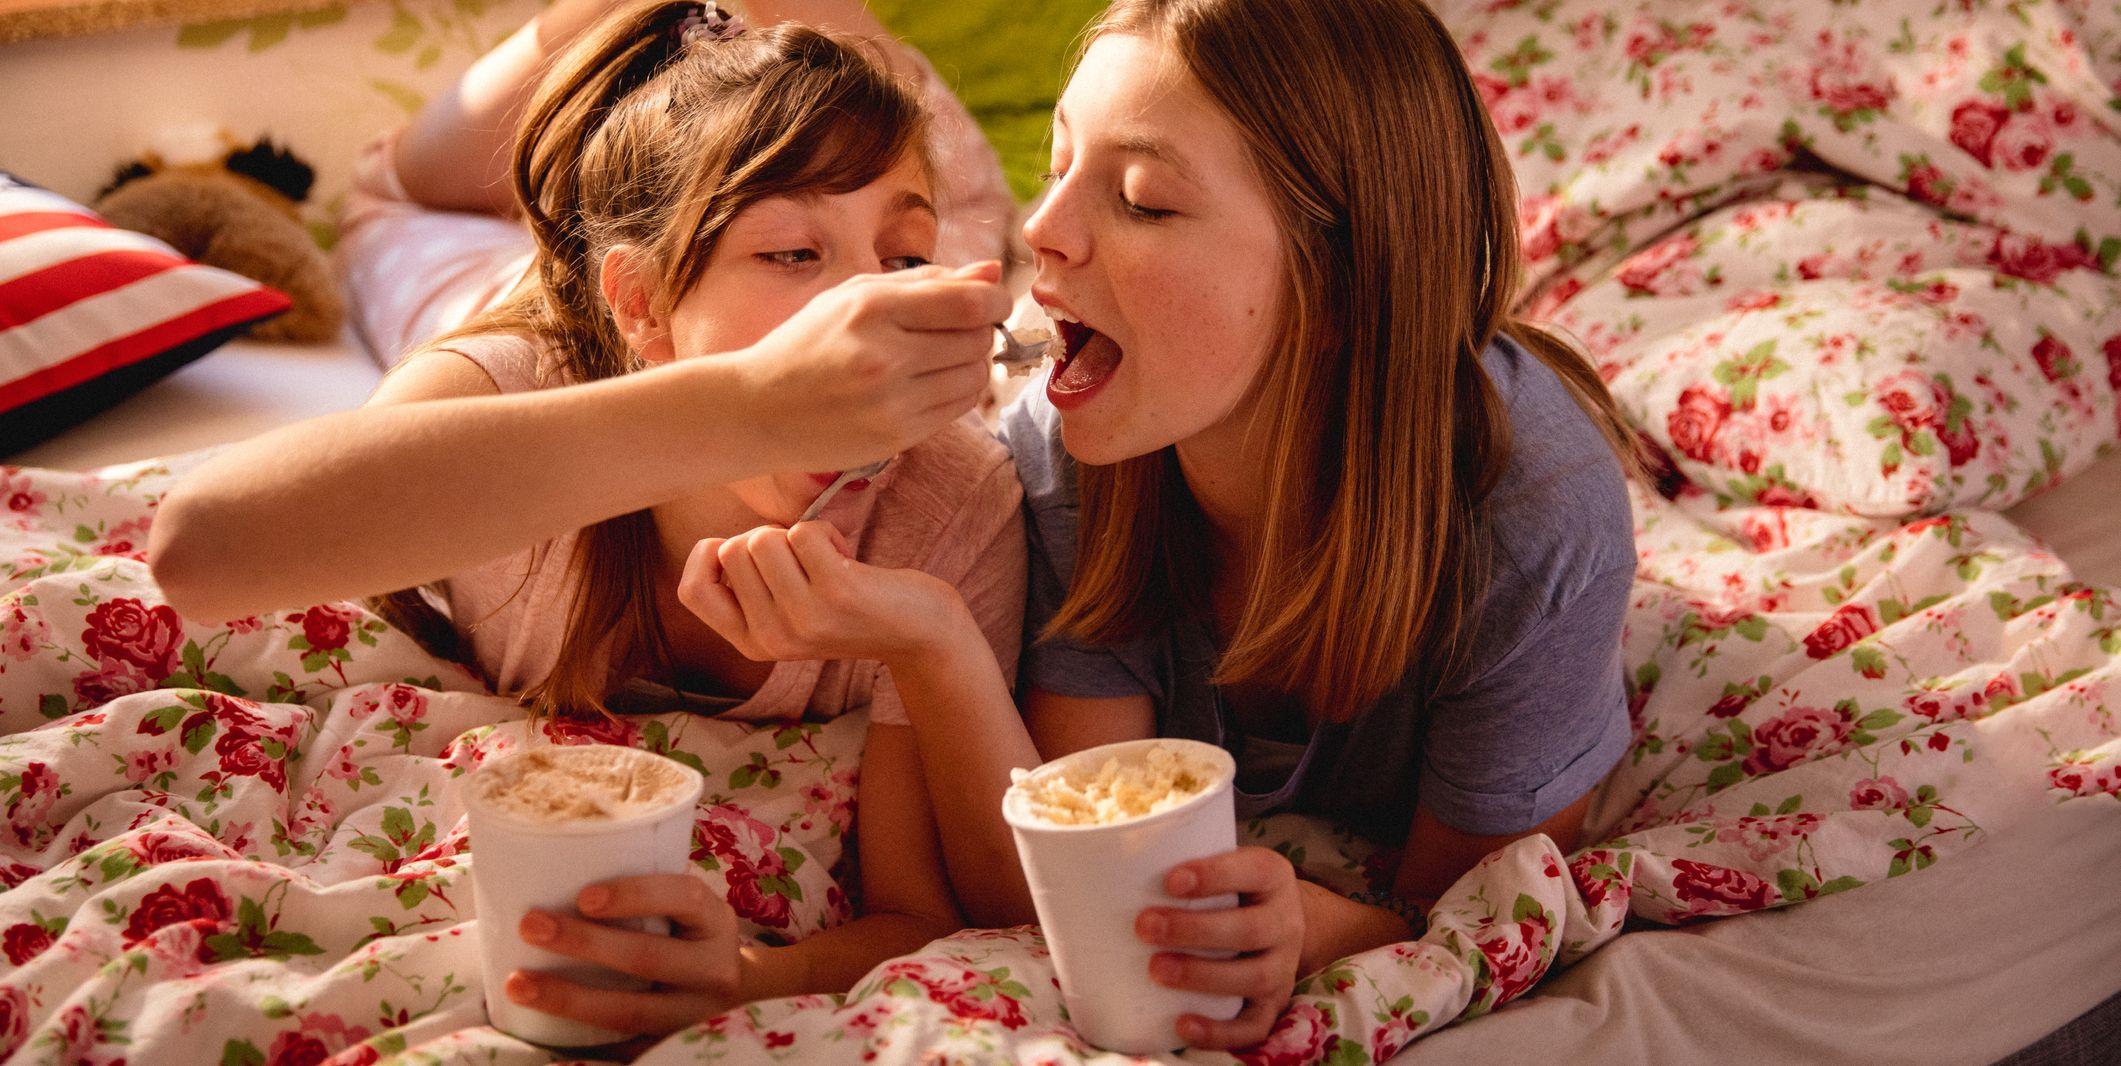 Girl feeding her friend ice cream from a tub